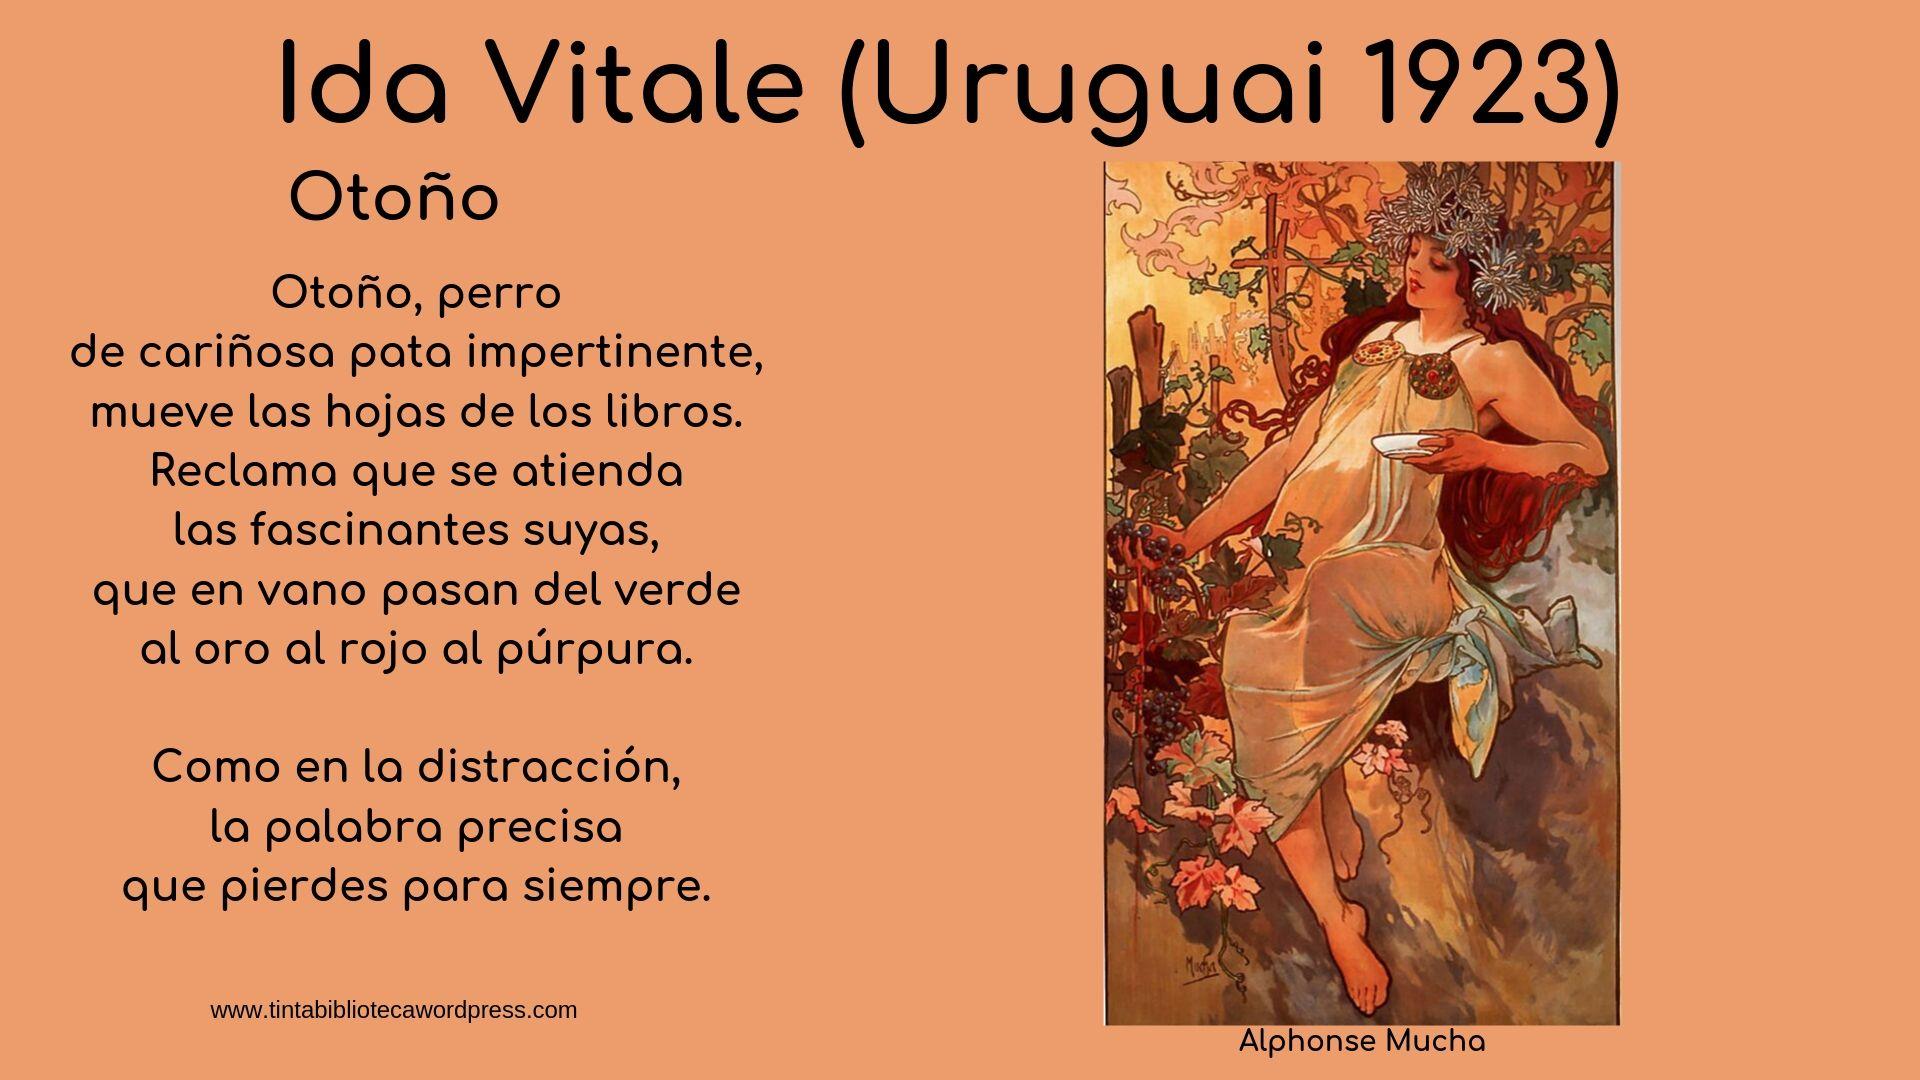 Ida Vitale( Uruguai 1923)